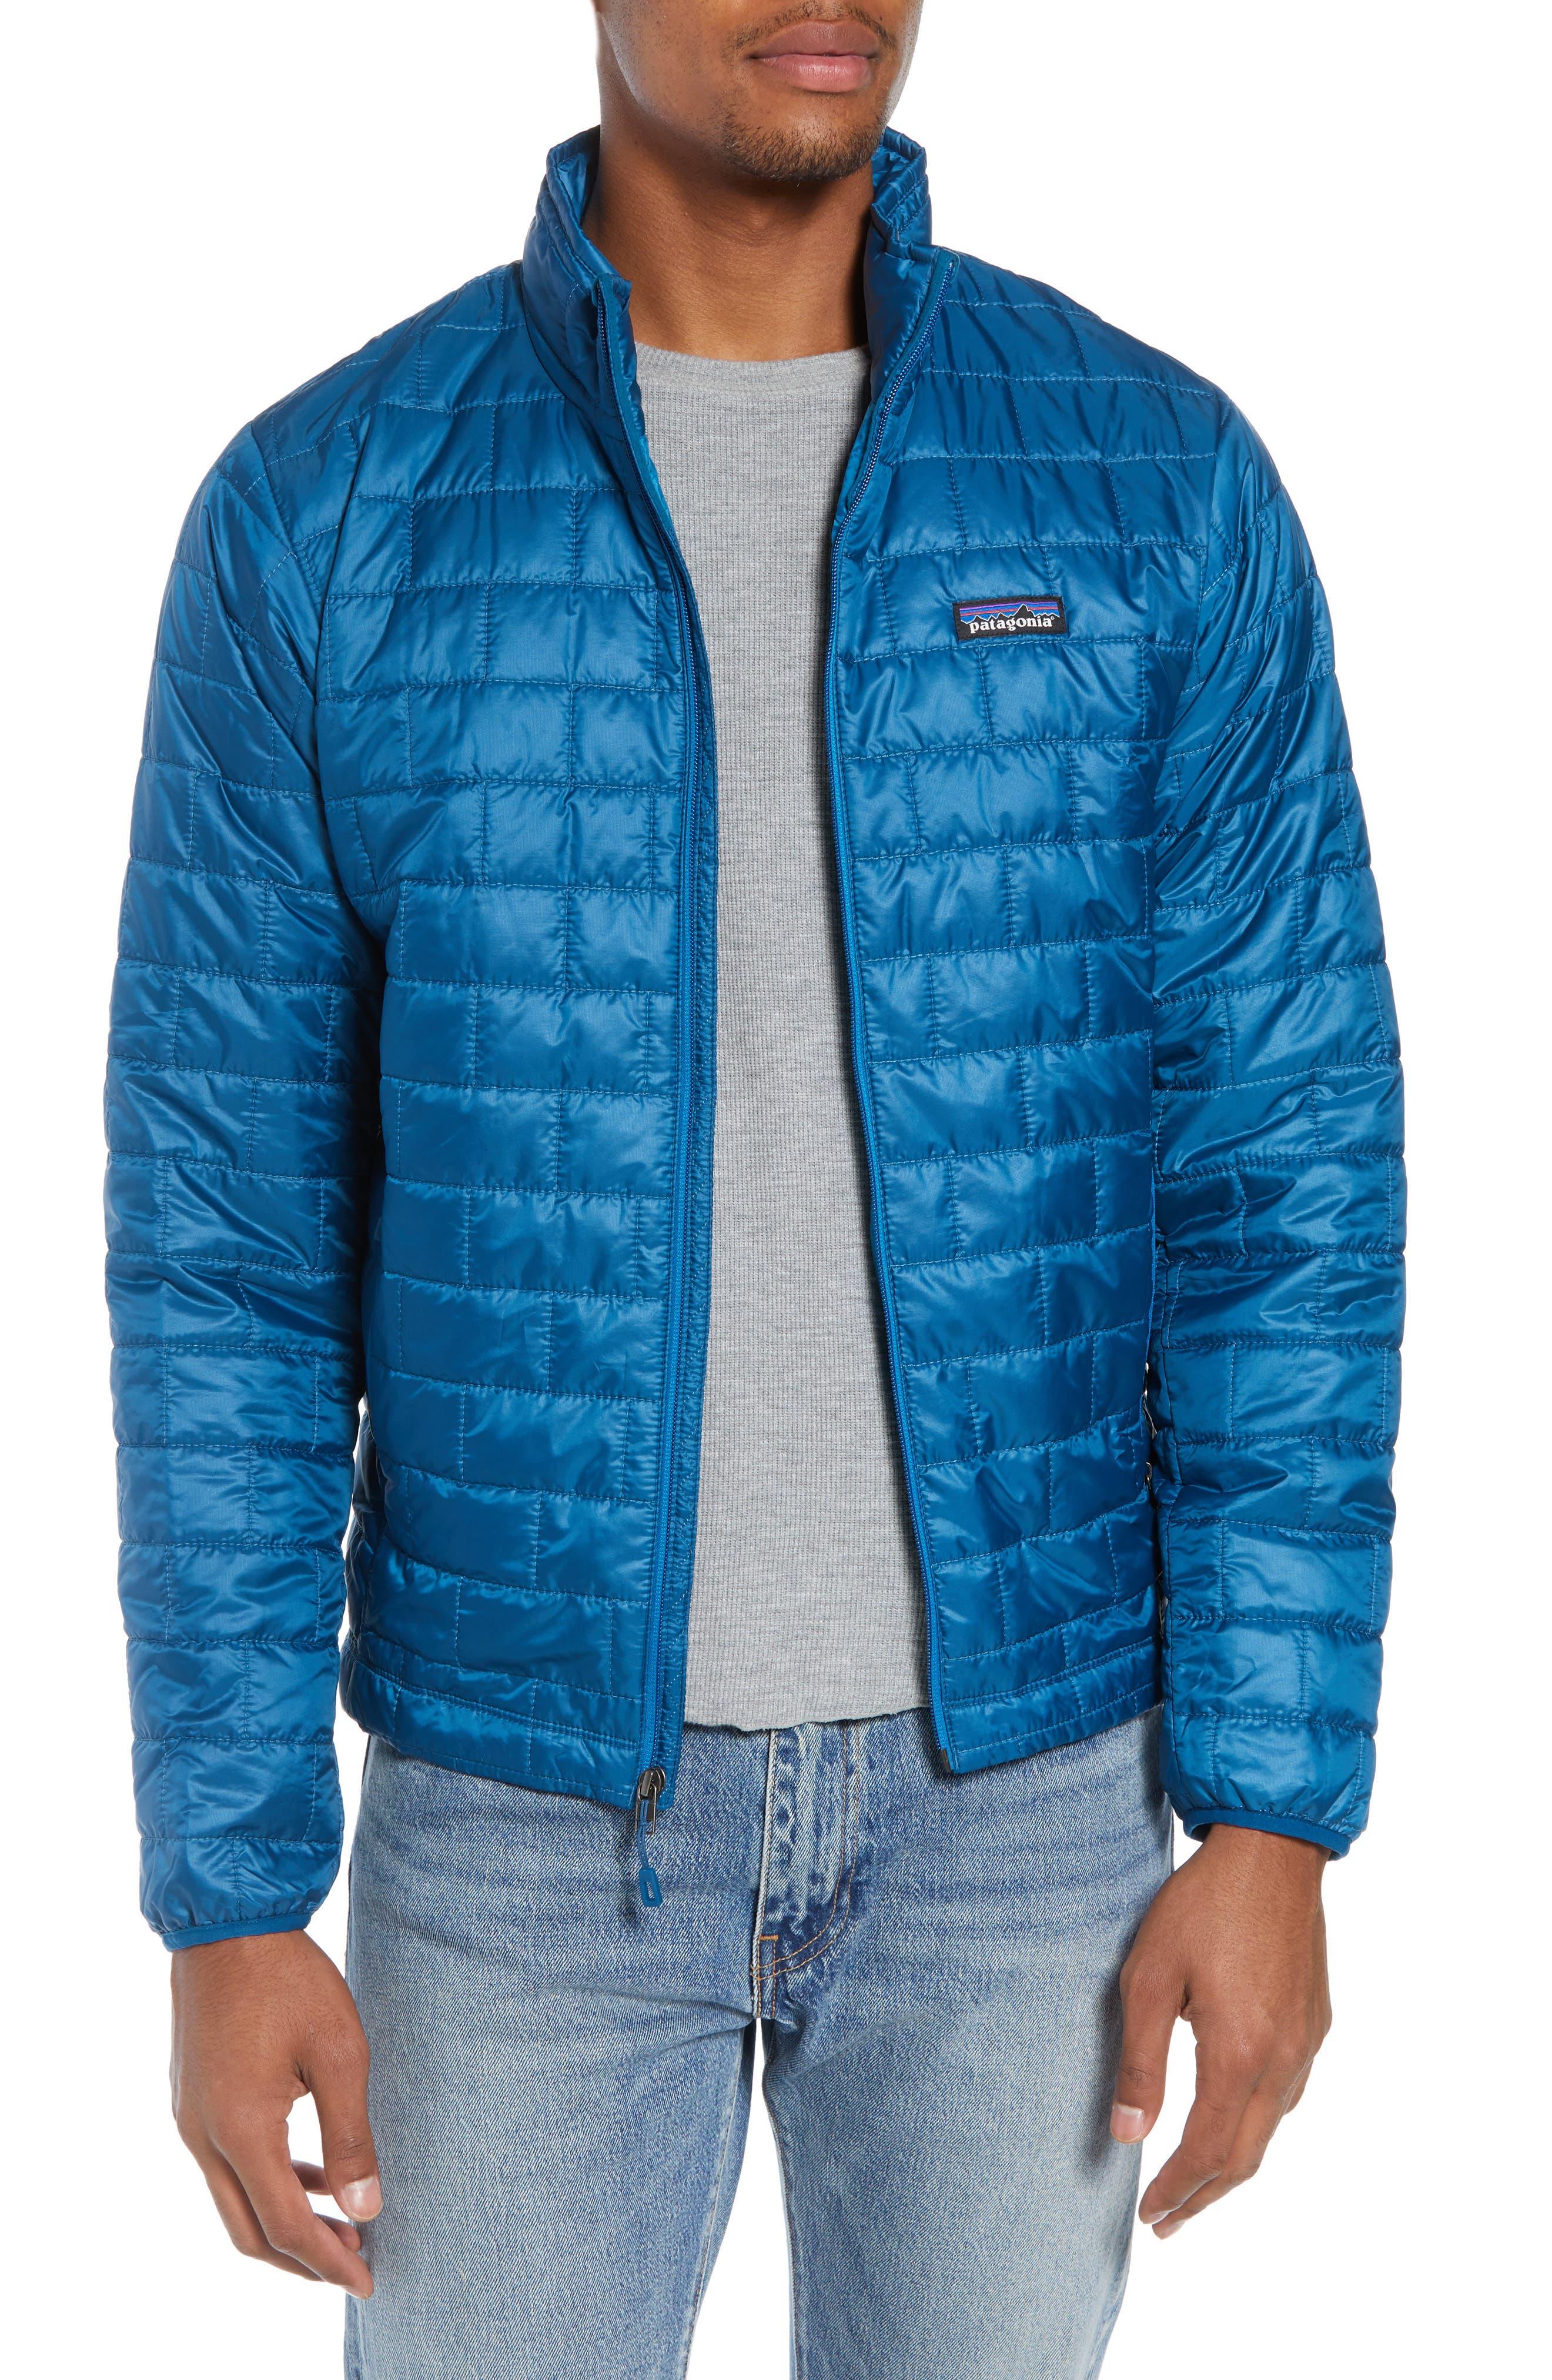 PATAGONIA 'Nano Puff<sup>®</sup>' Water Resistant Jacket, Main, color, BIG SUR BLUE W/ BALKAN BLUE